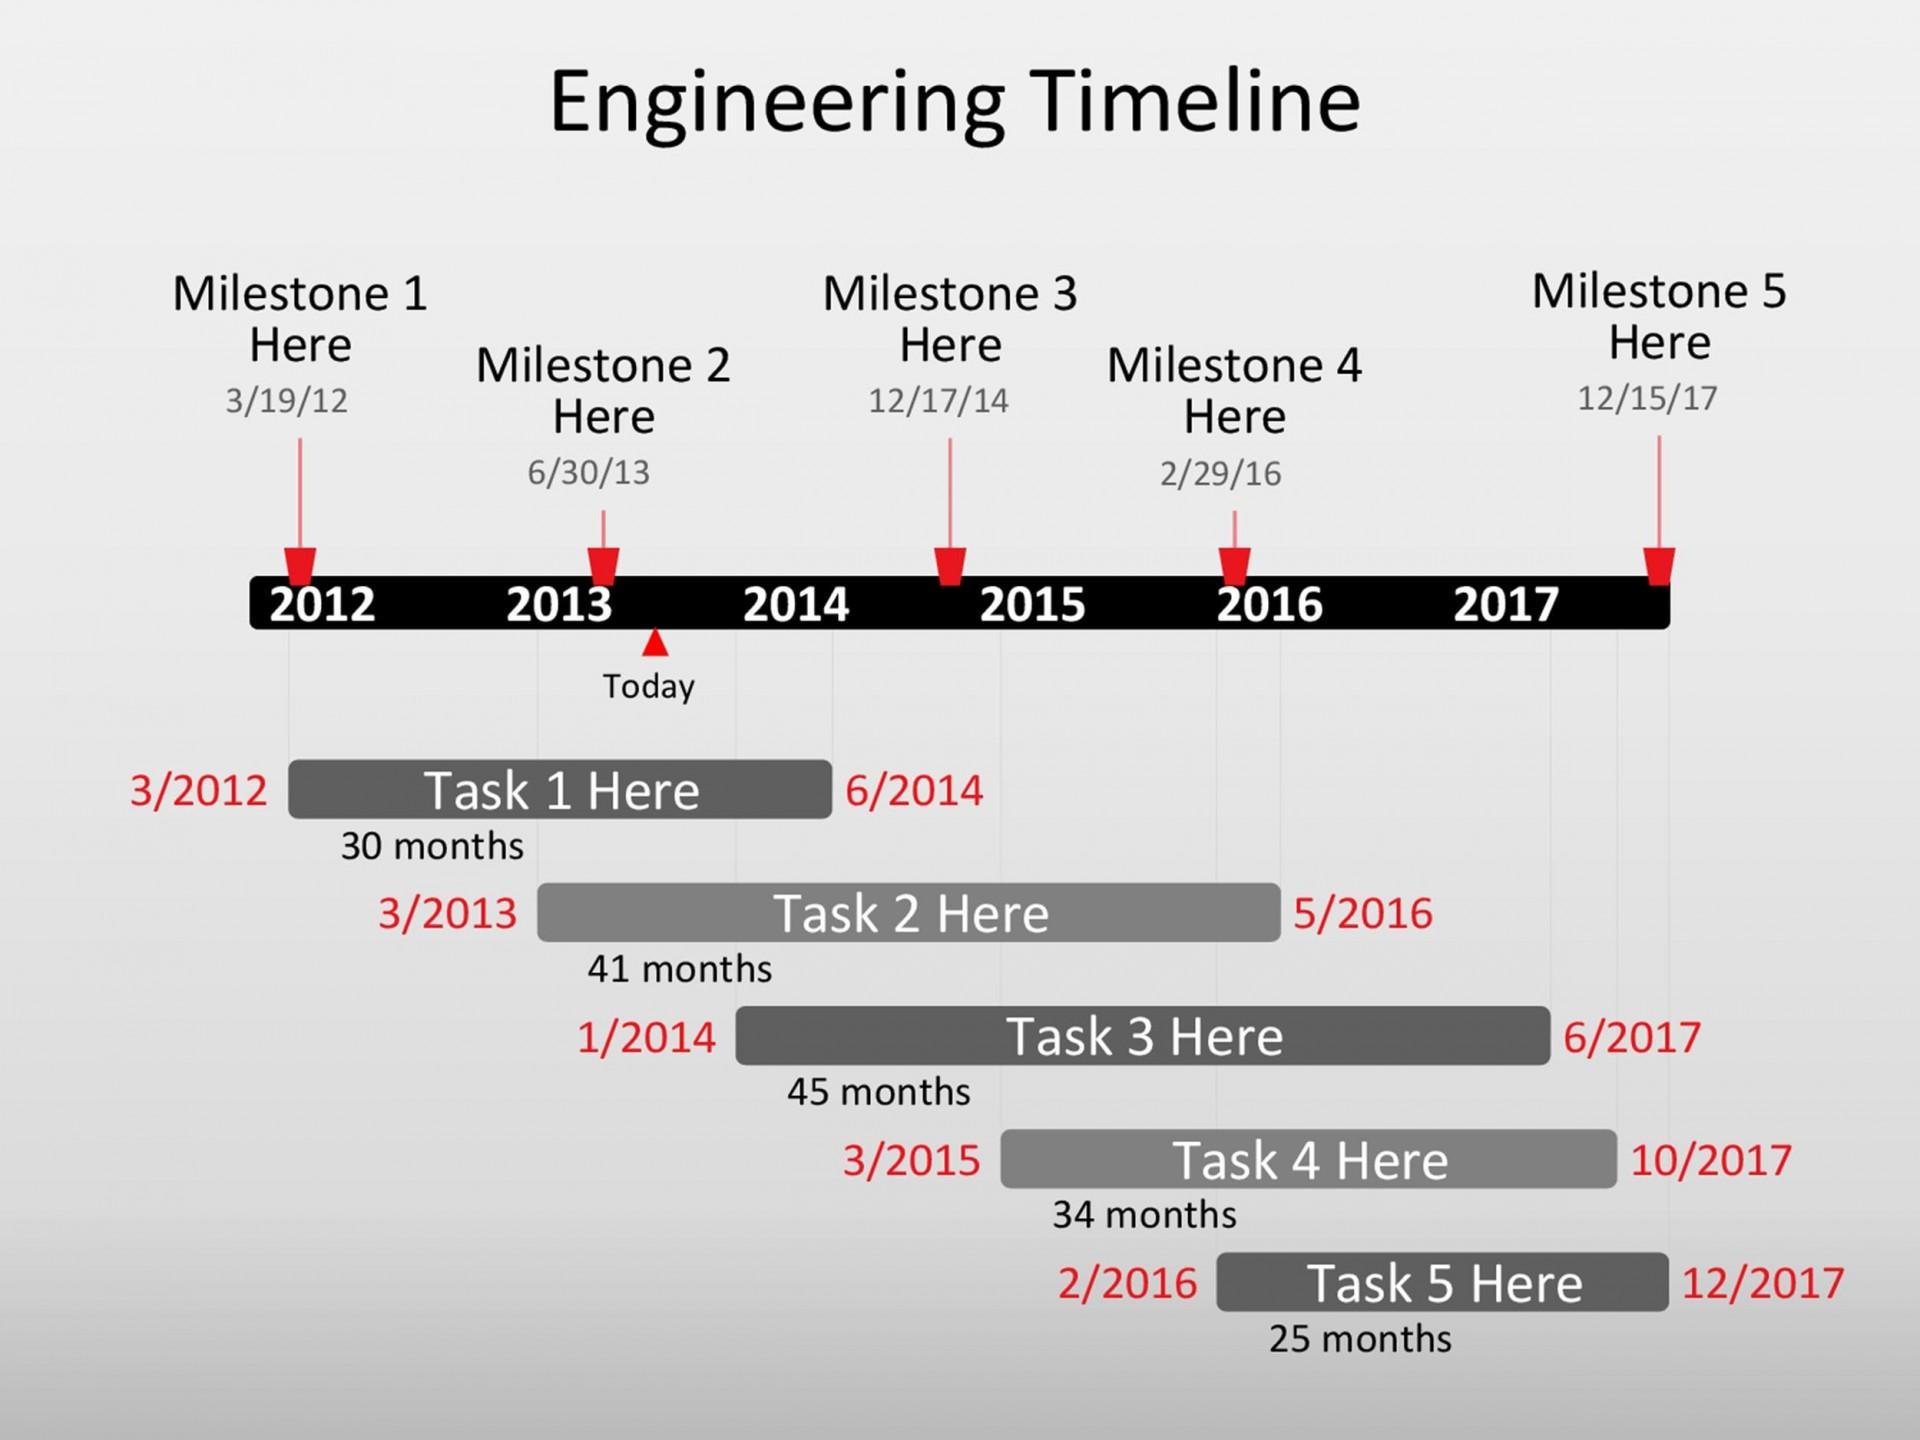 007 Amazing Timeline Template In Word Idea  2010 Wordpres Free1920